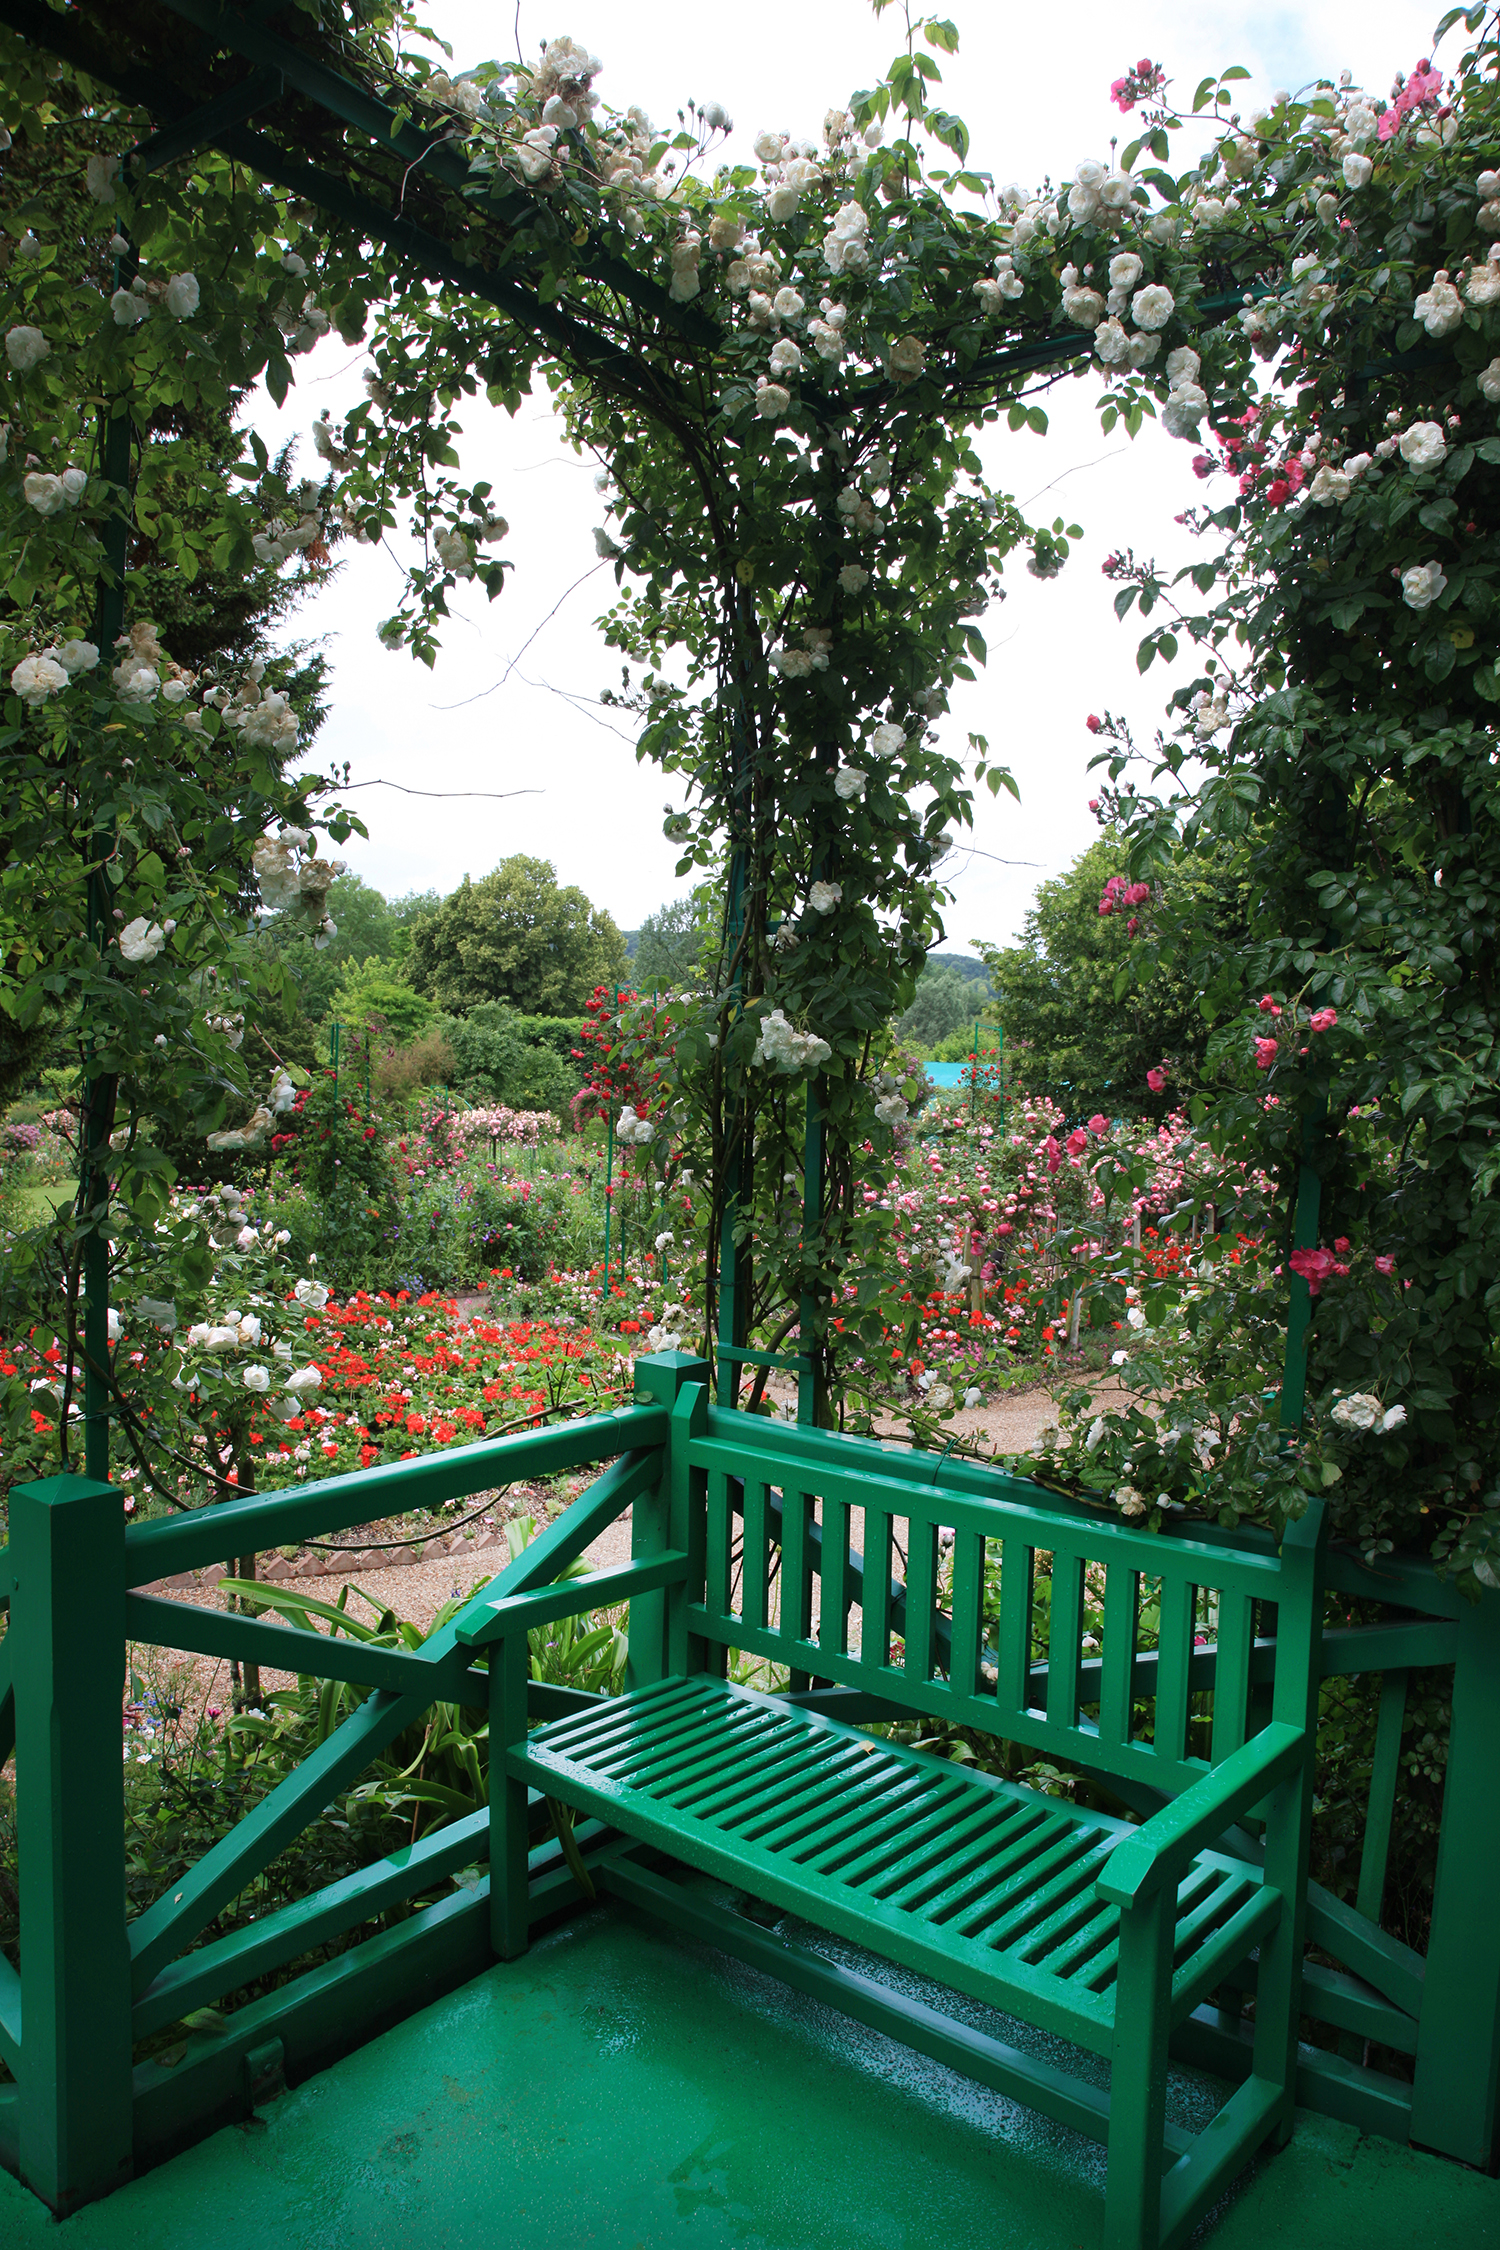 Monet's Bench